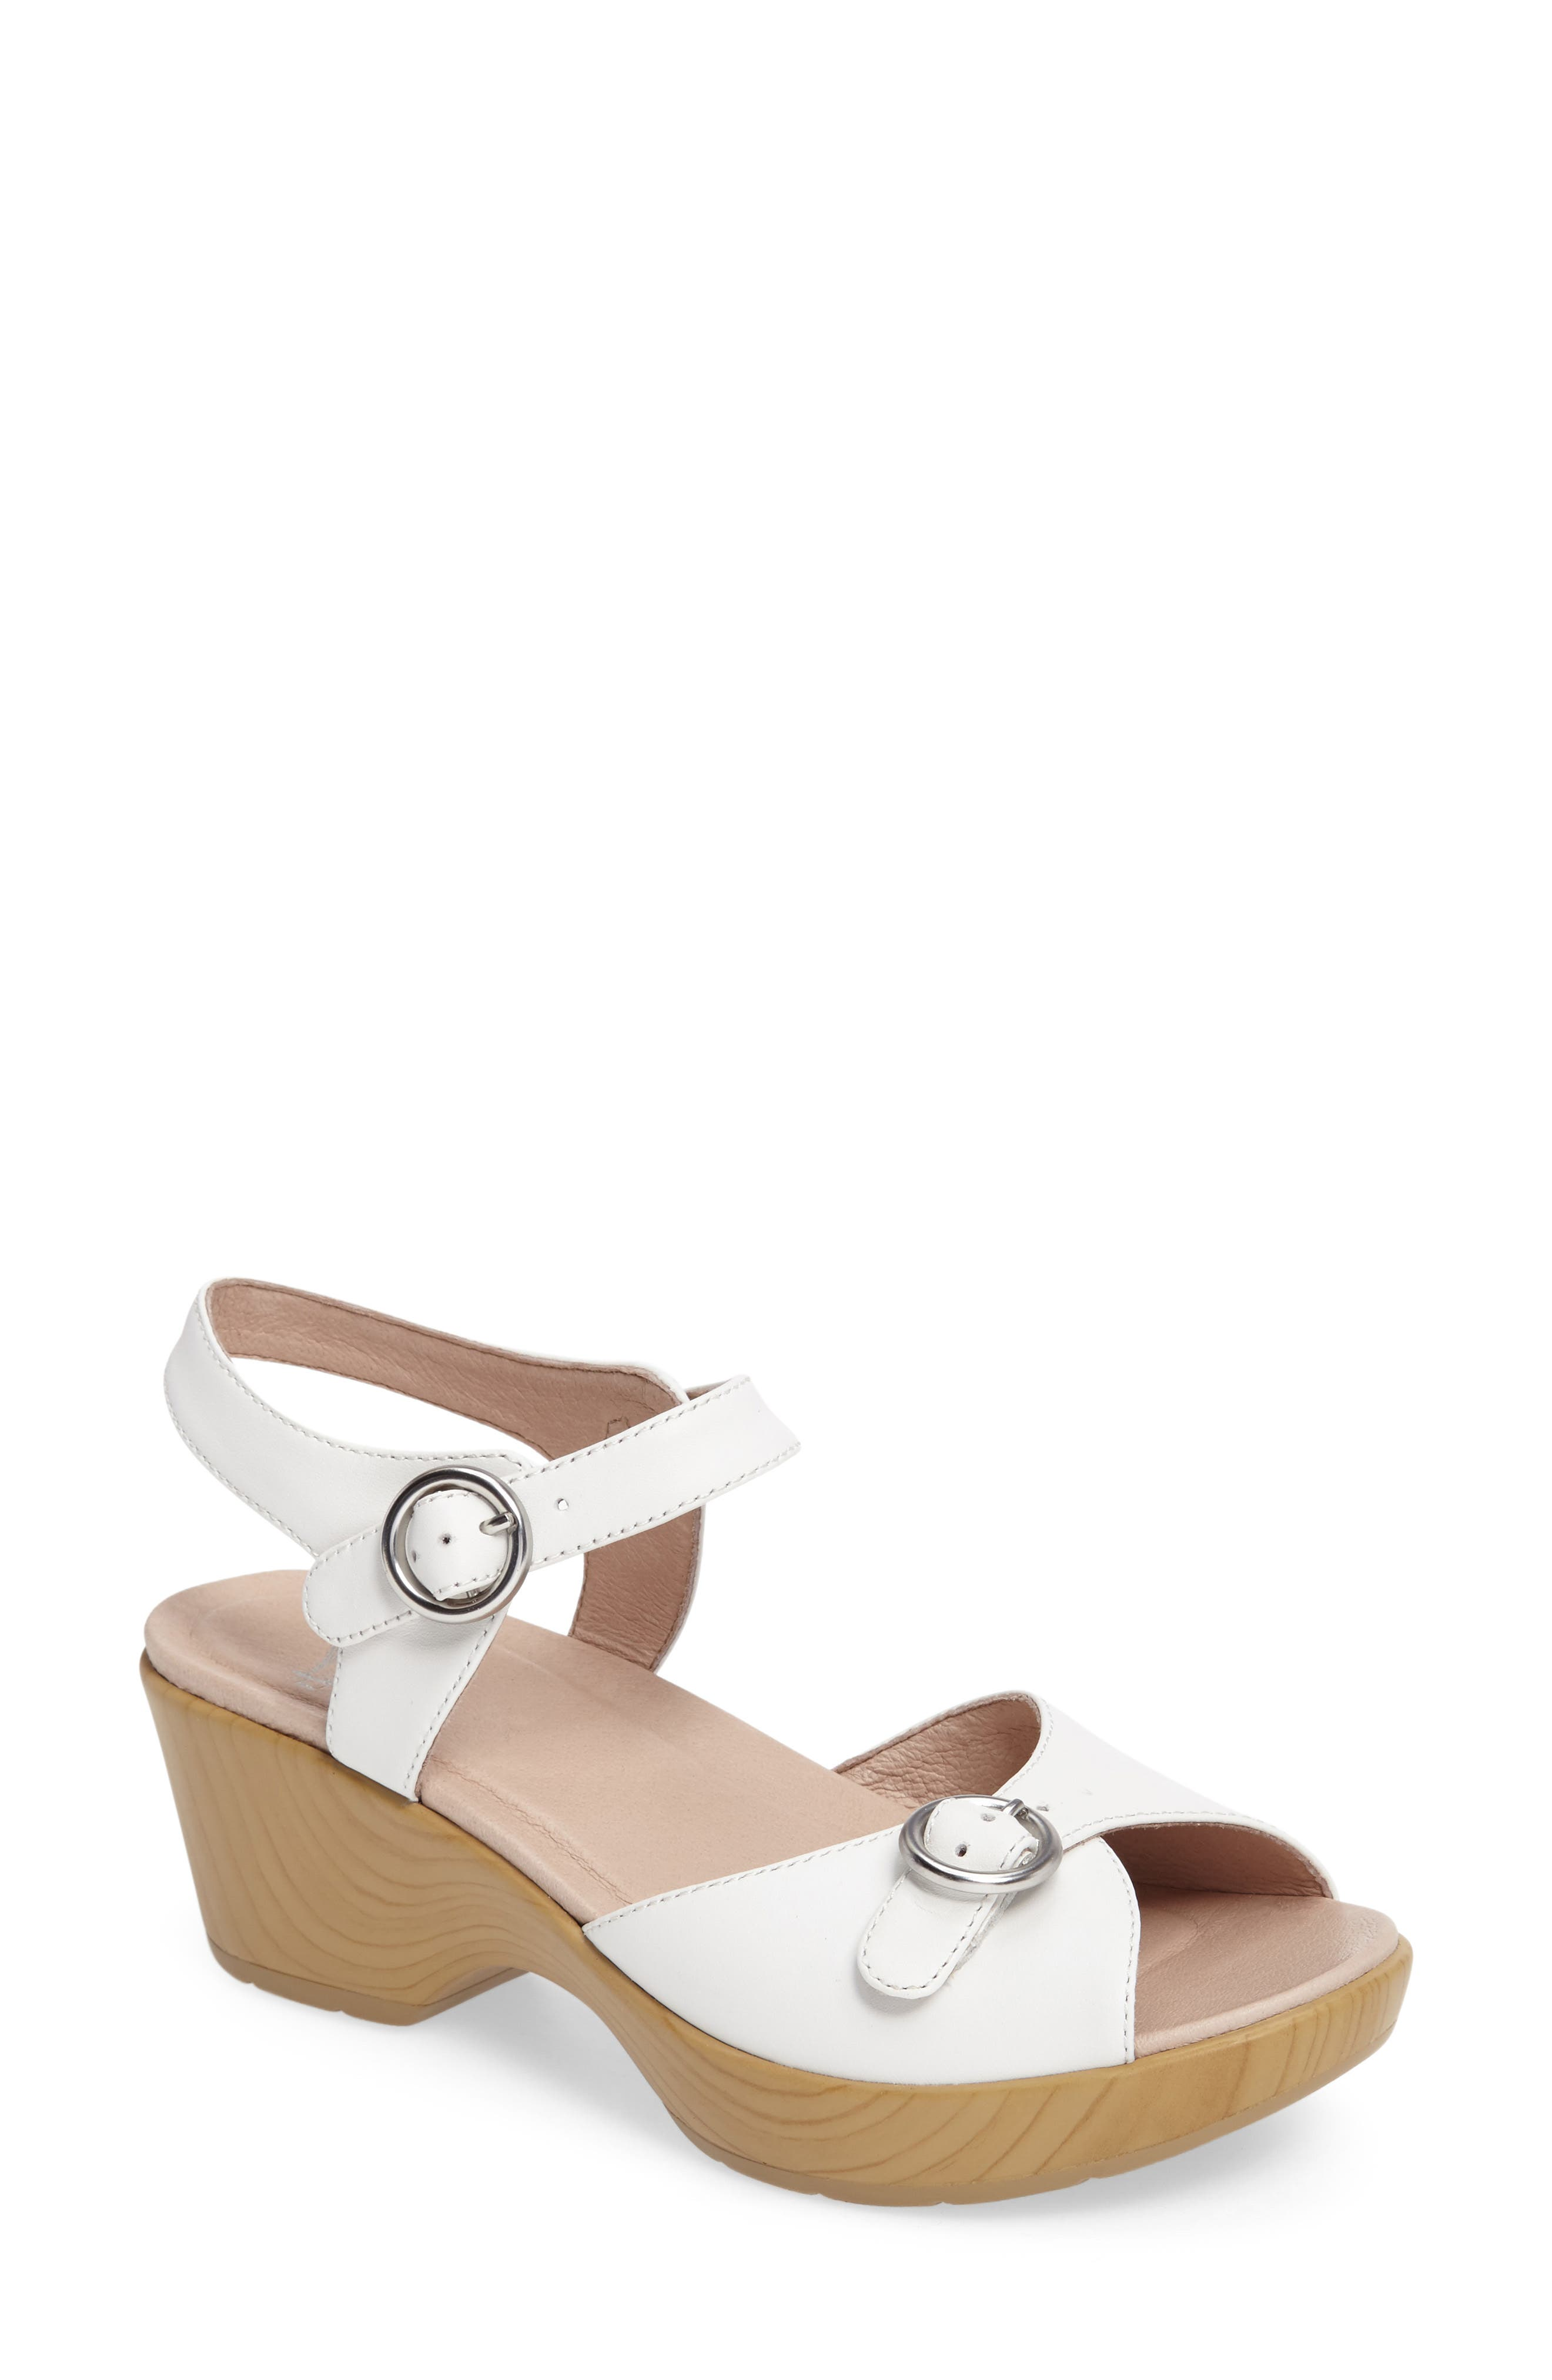 DANSKO June Platform Sandal